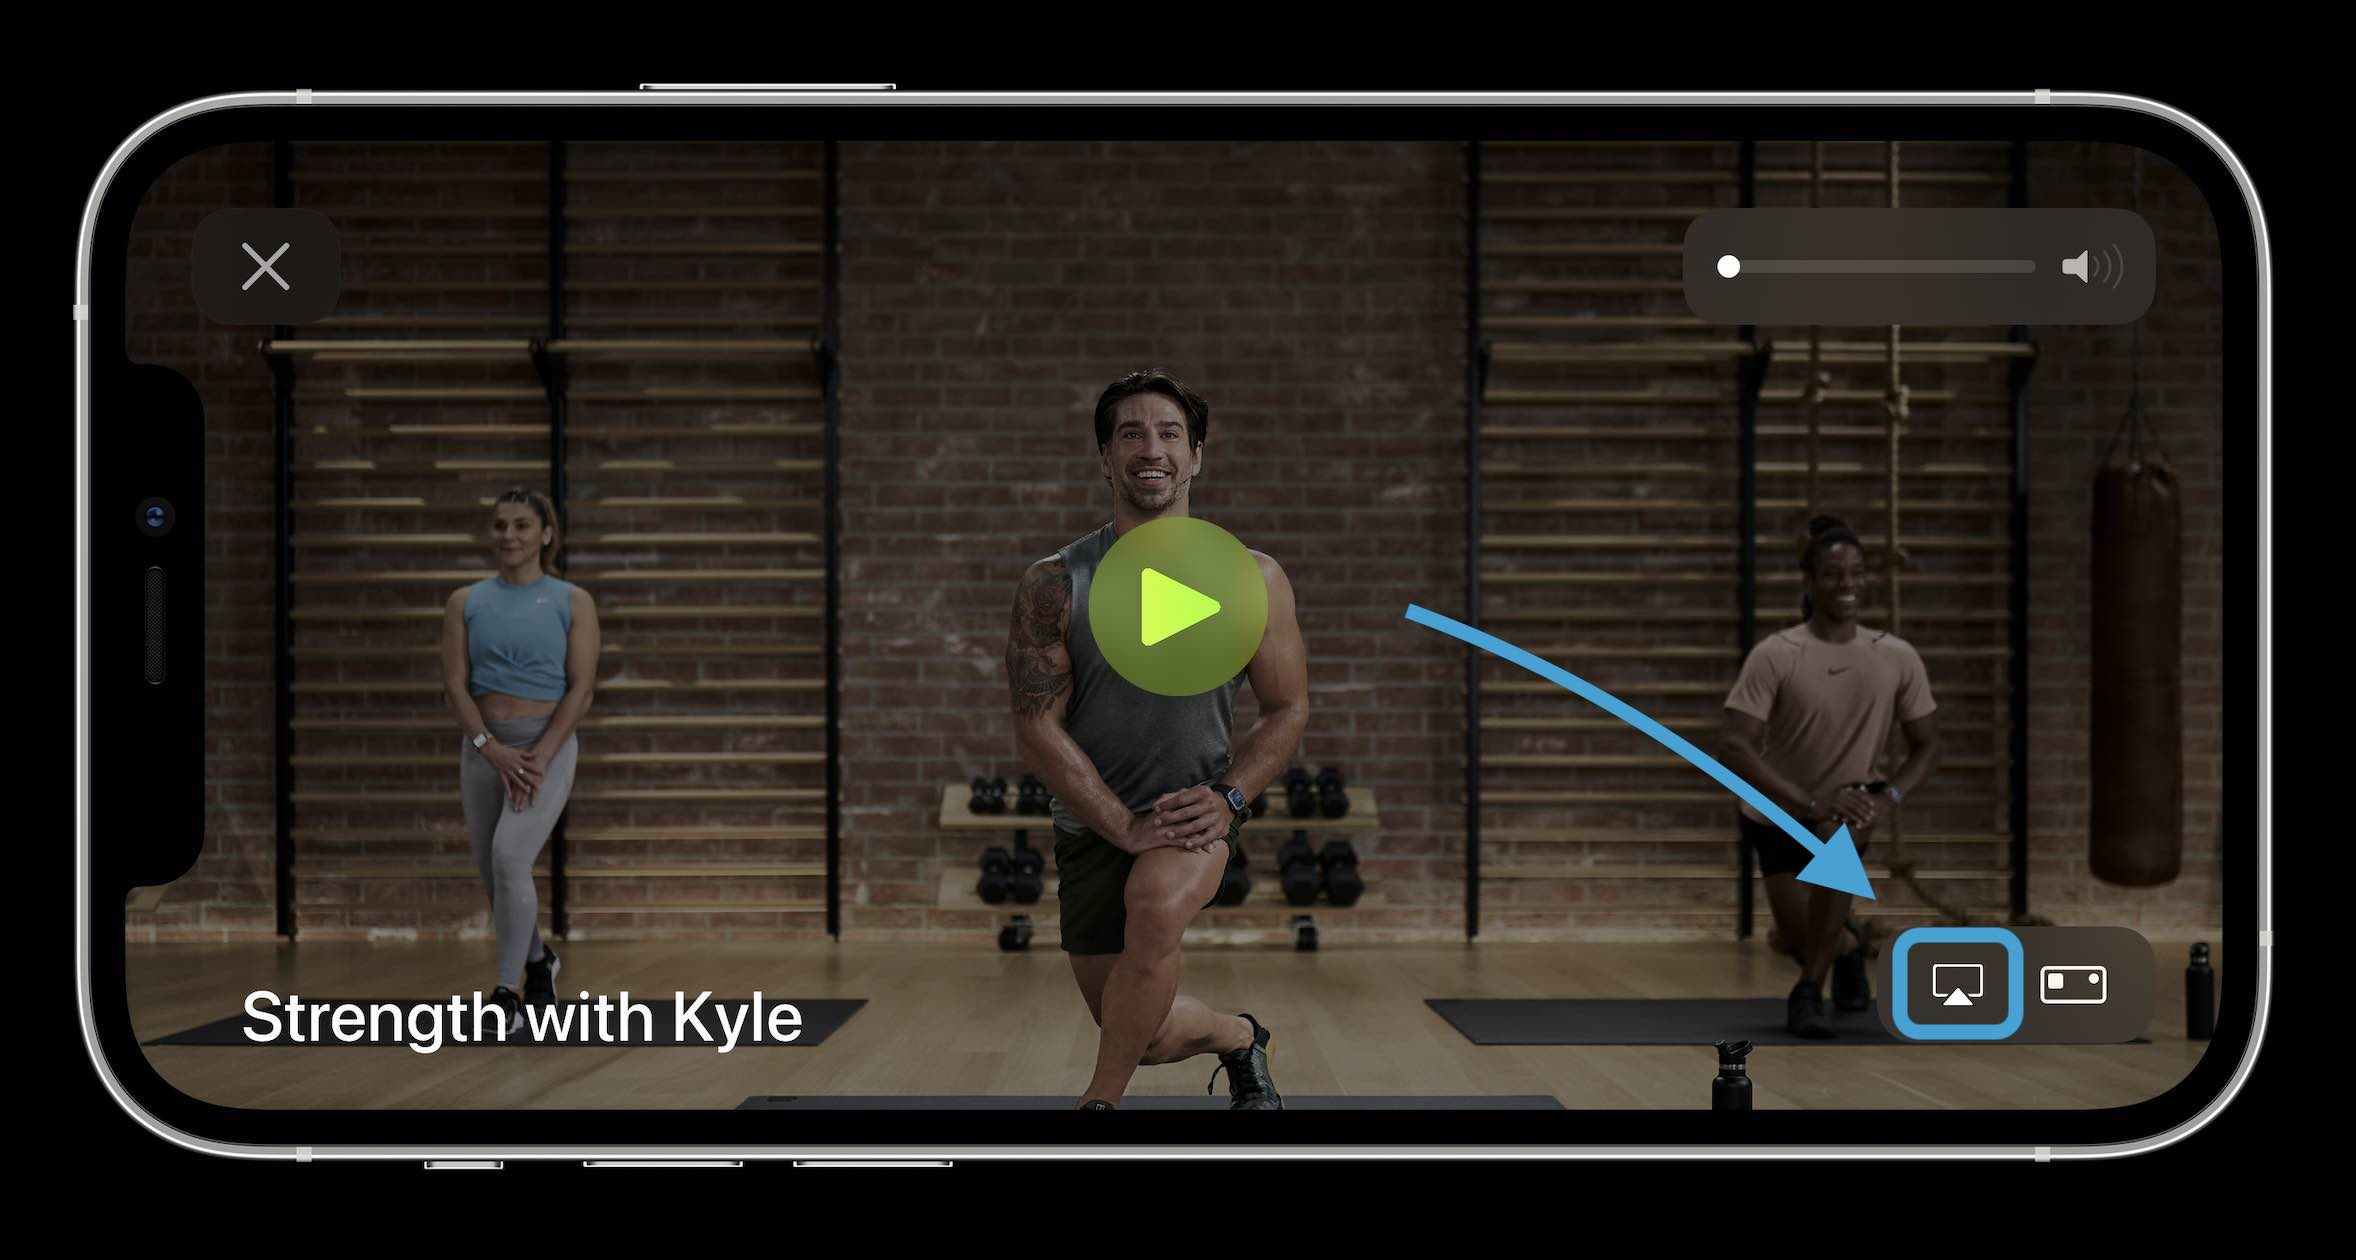 Как AirPlay Apple Fitness + классы к телевизору - пошаговое руководство 1